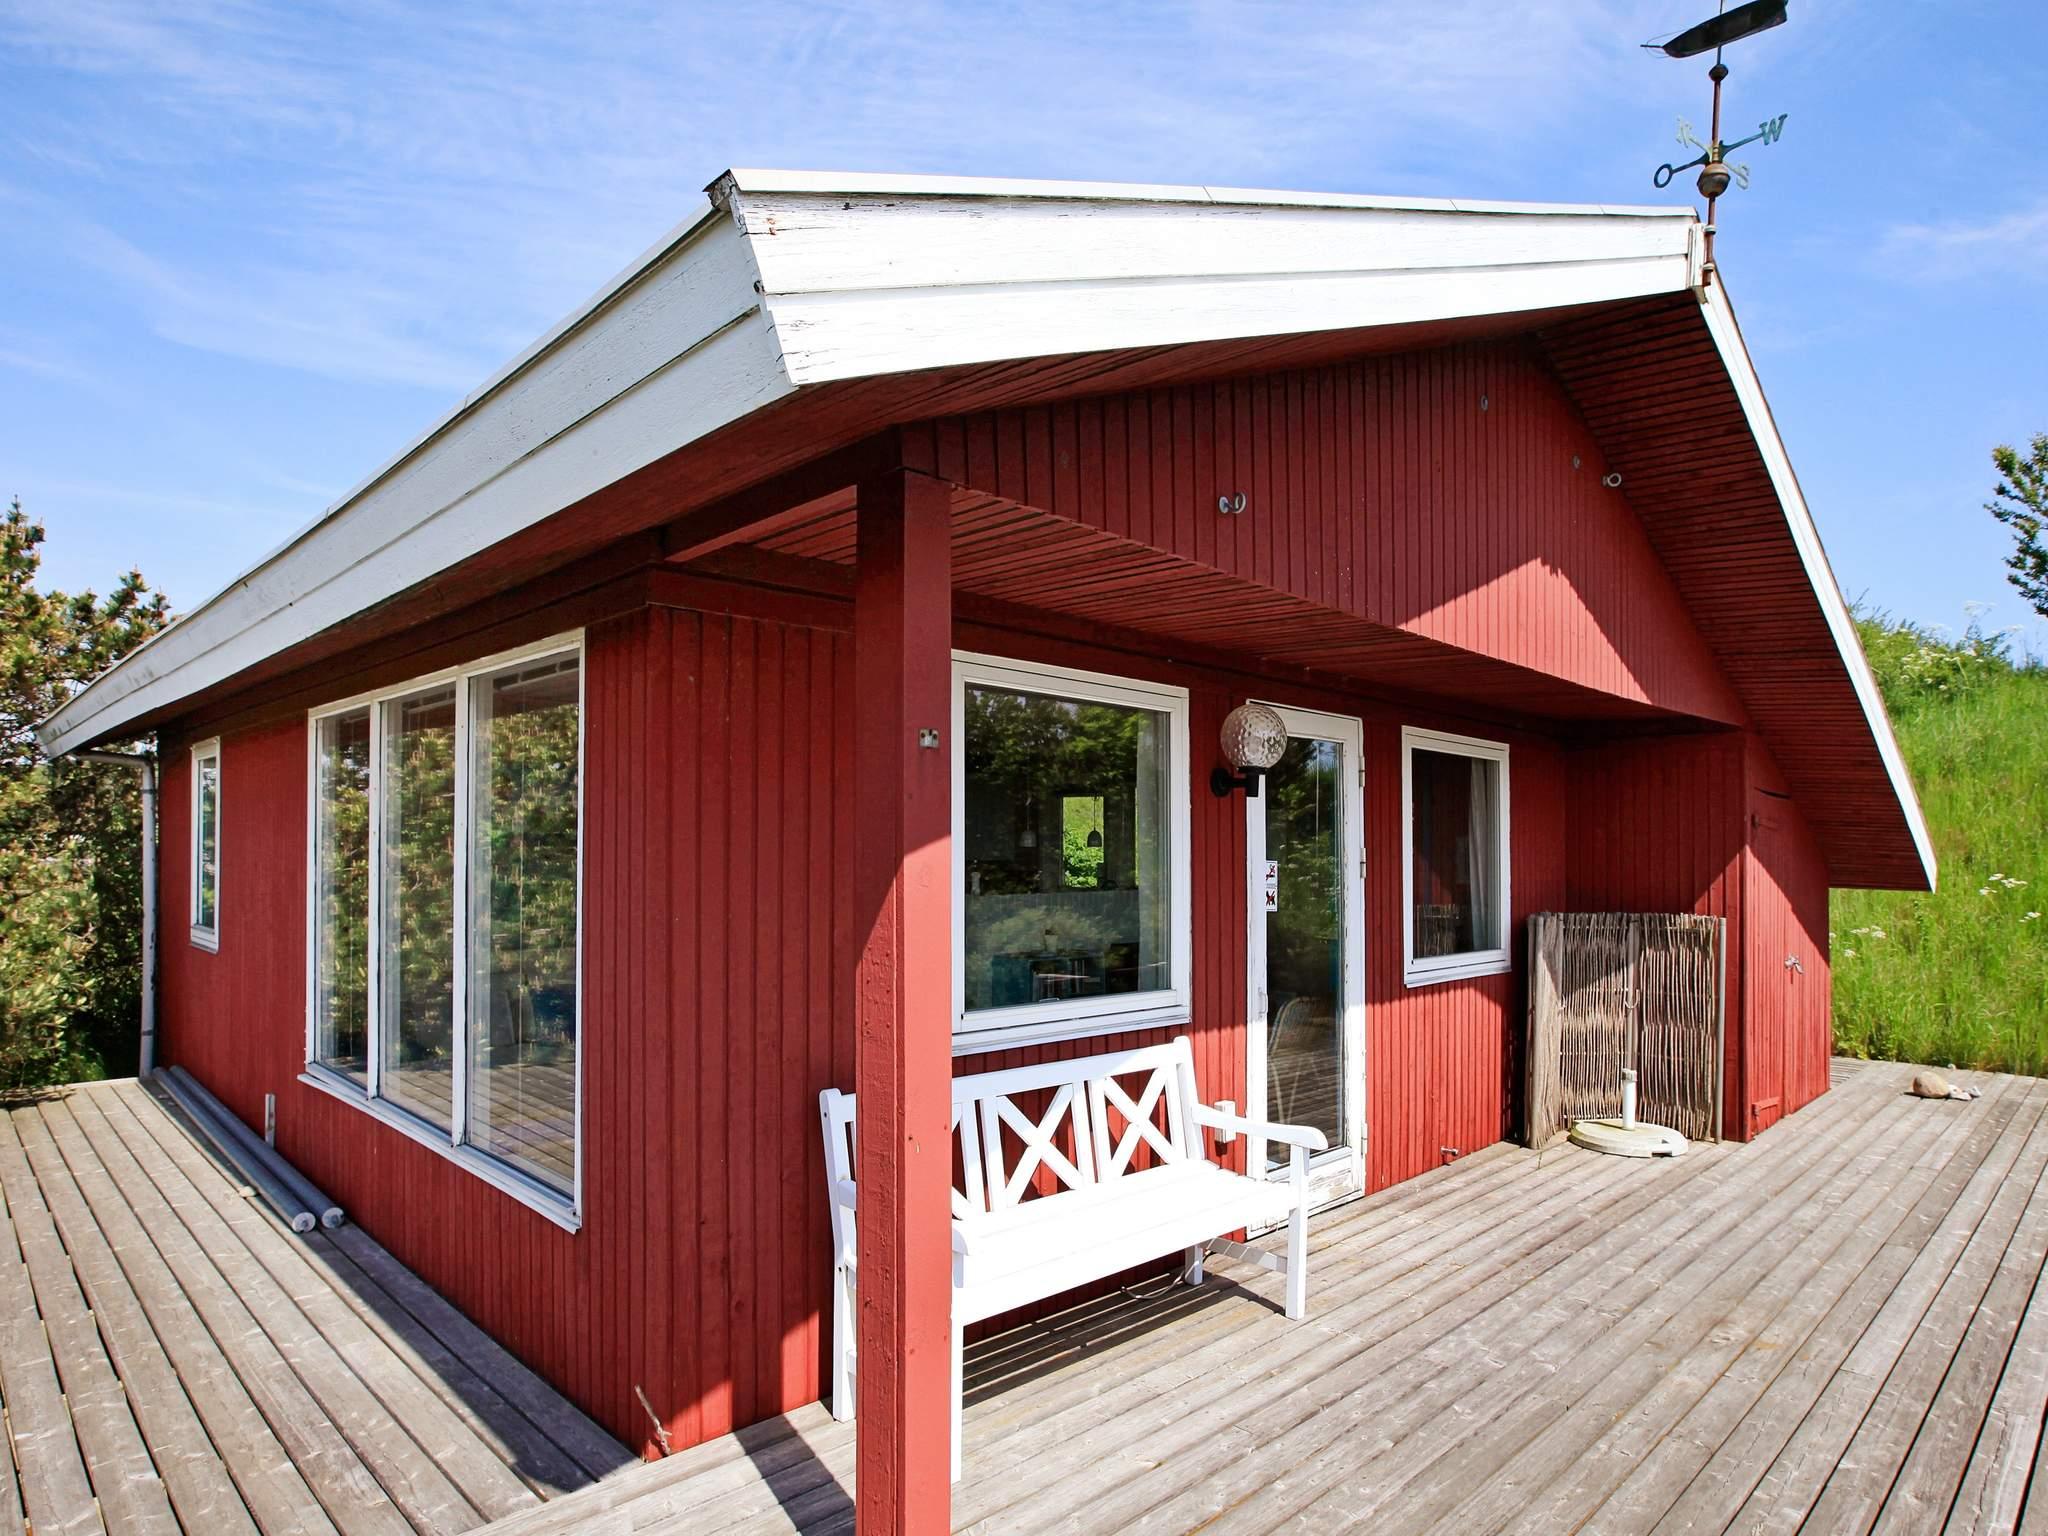 Maison de vacances Helgenæs (921415), Knebel, , Jutland Est, Danemark, image 16